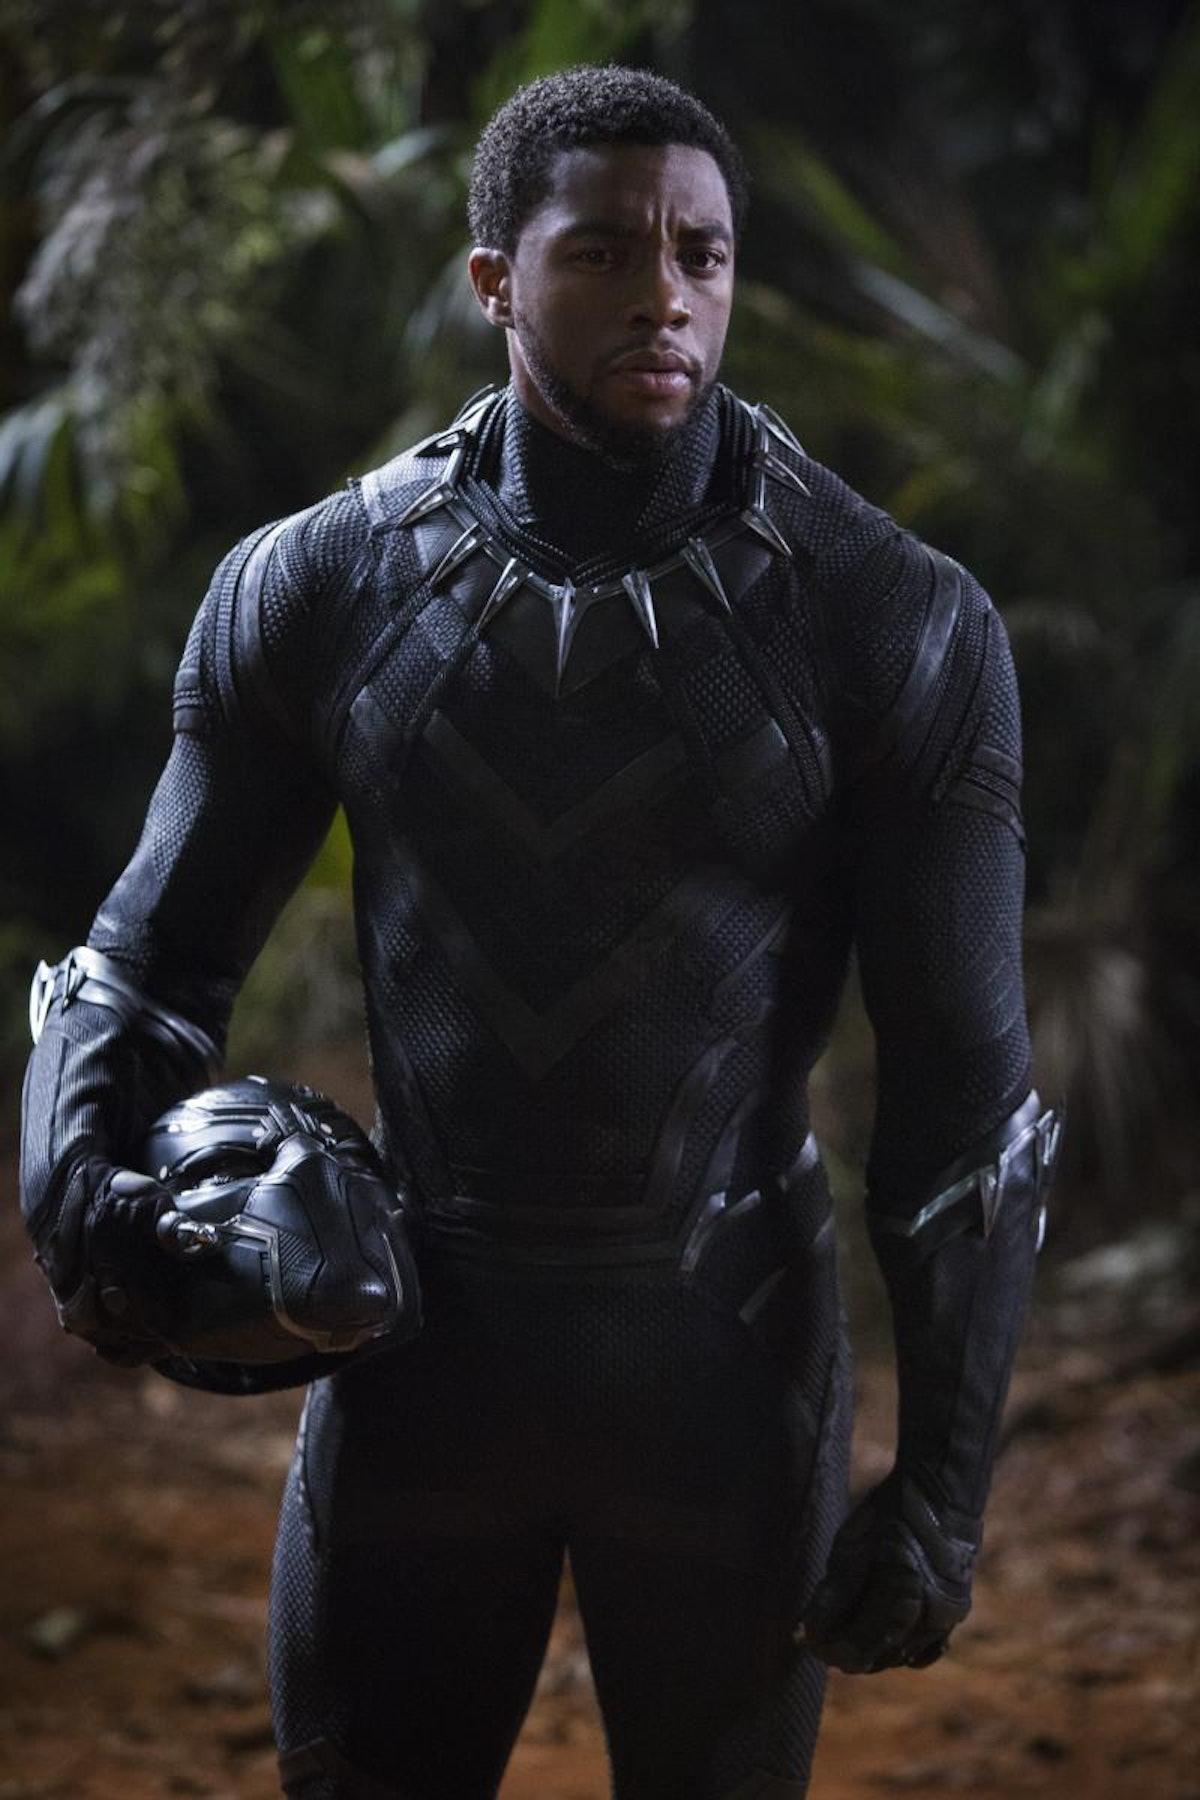 black_panther_suit.jpg